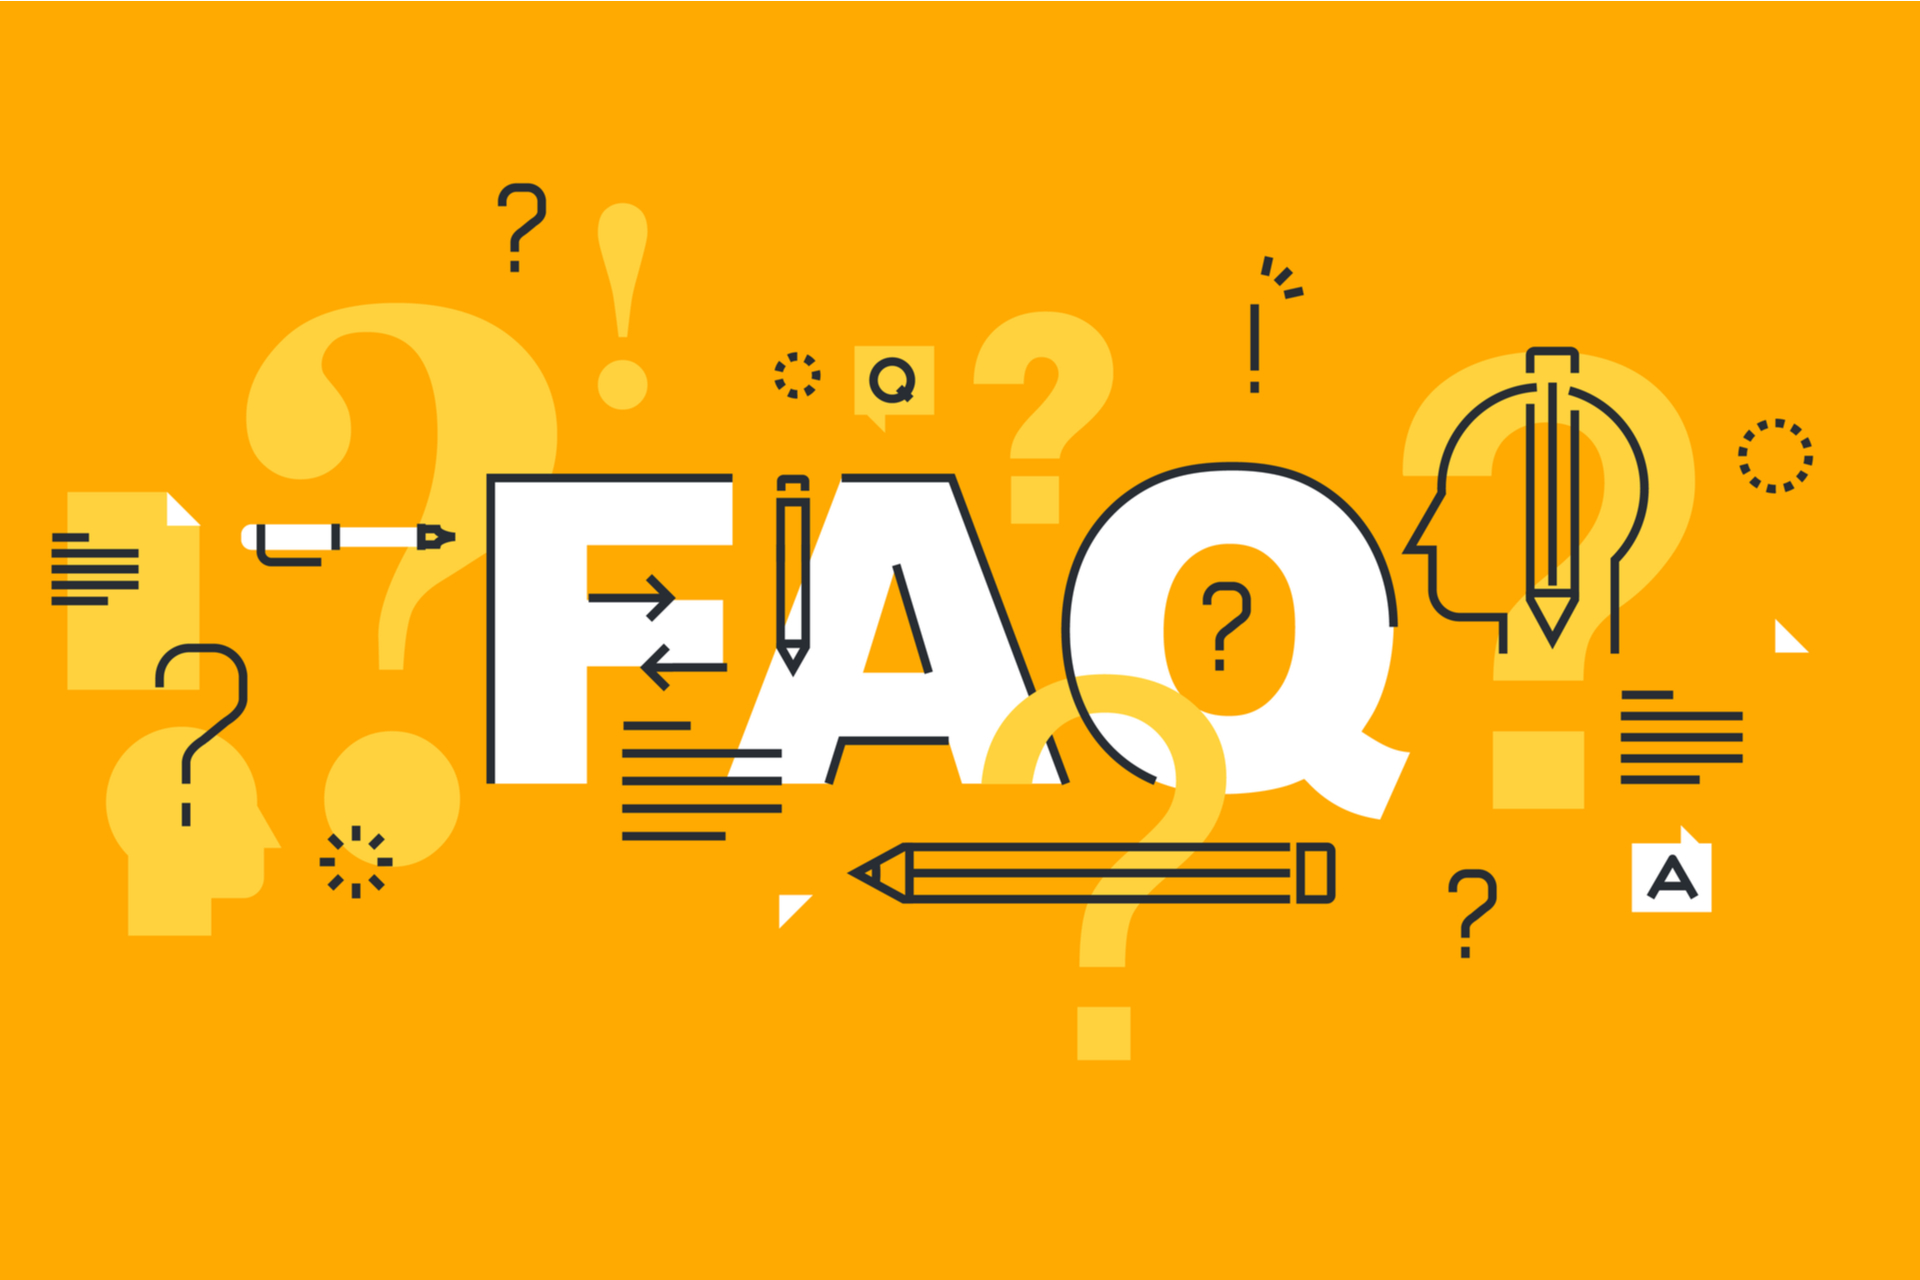 FAQ Issued Regarding Contraceptive Coverage Rules